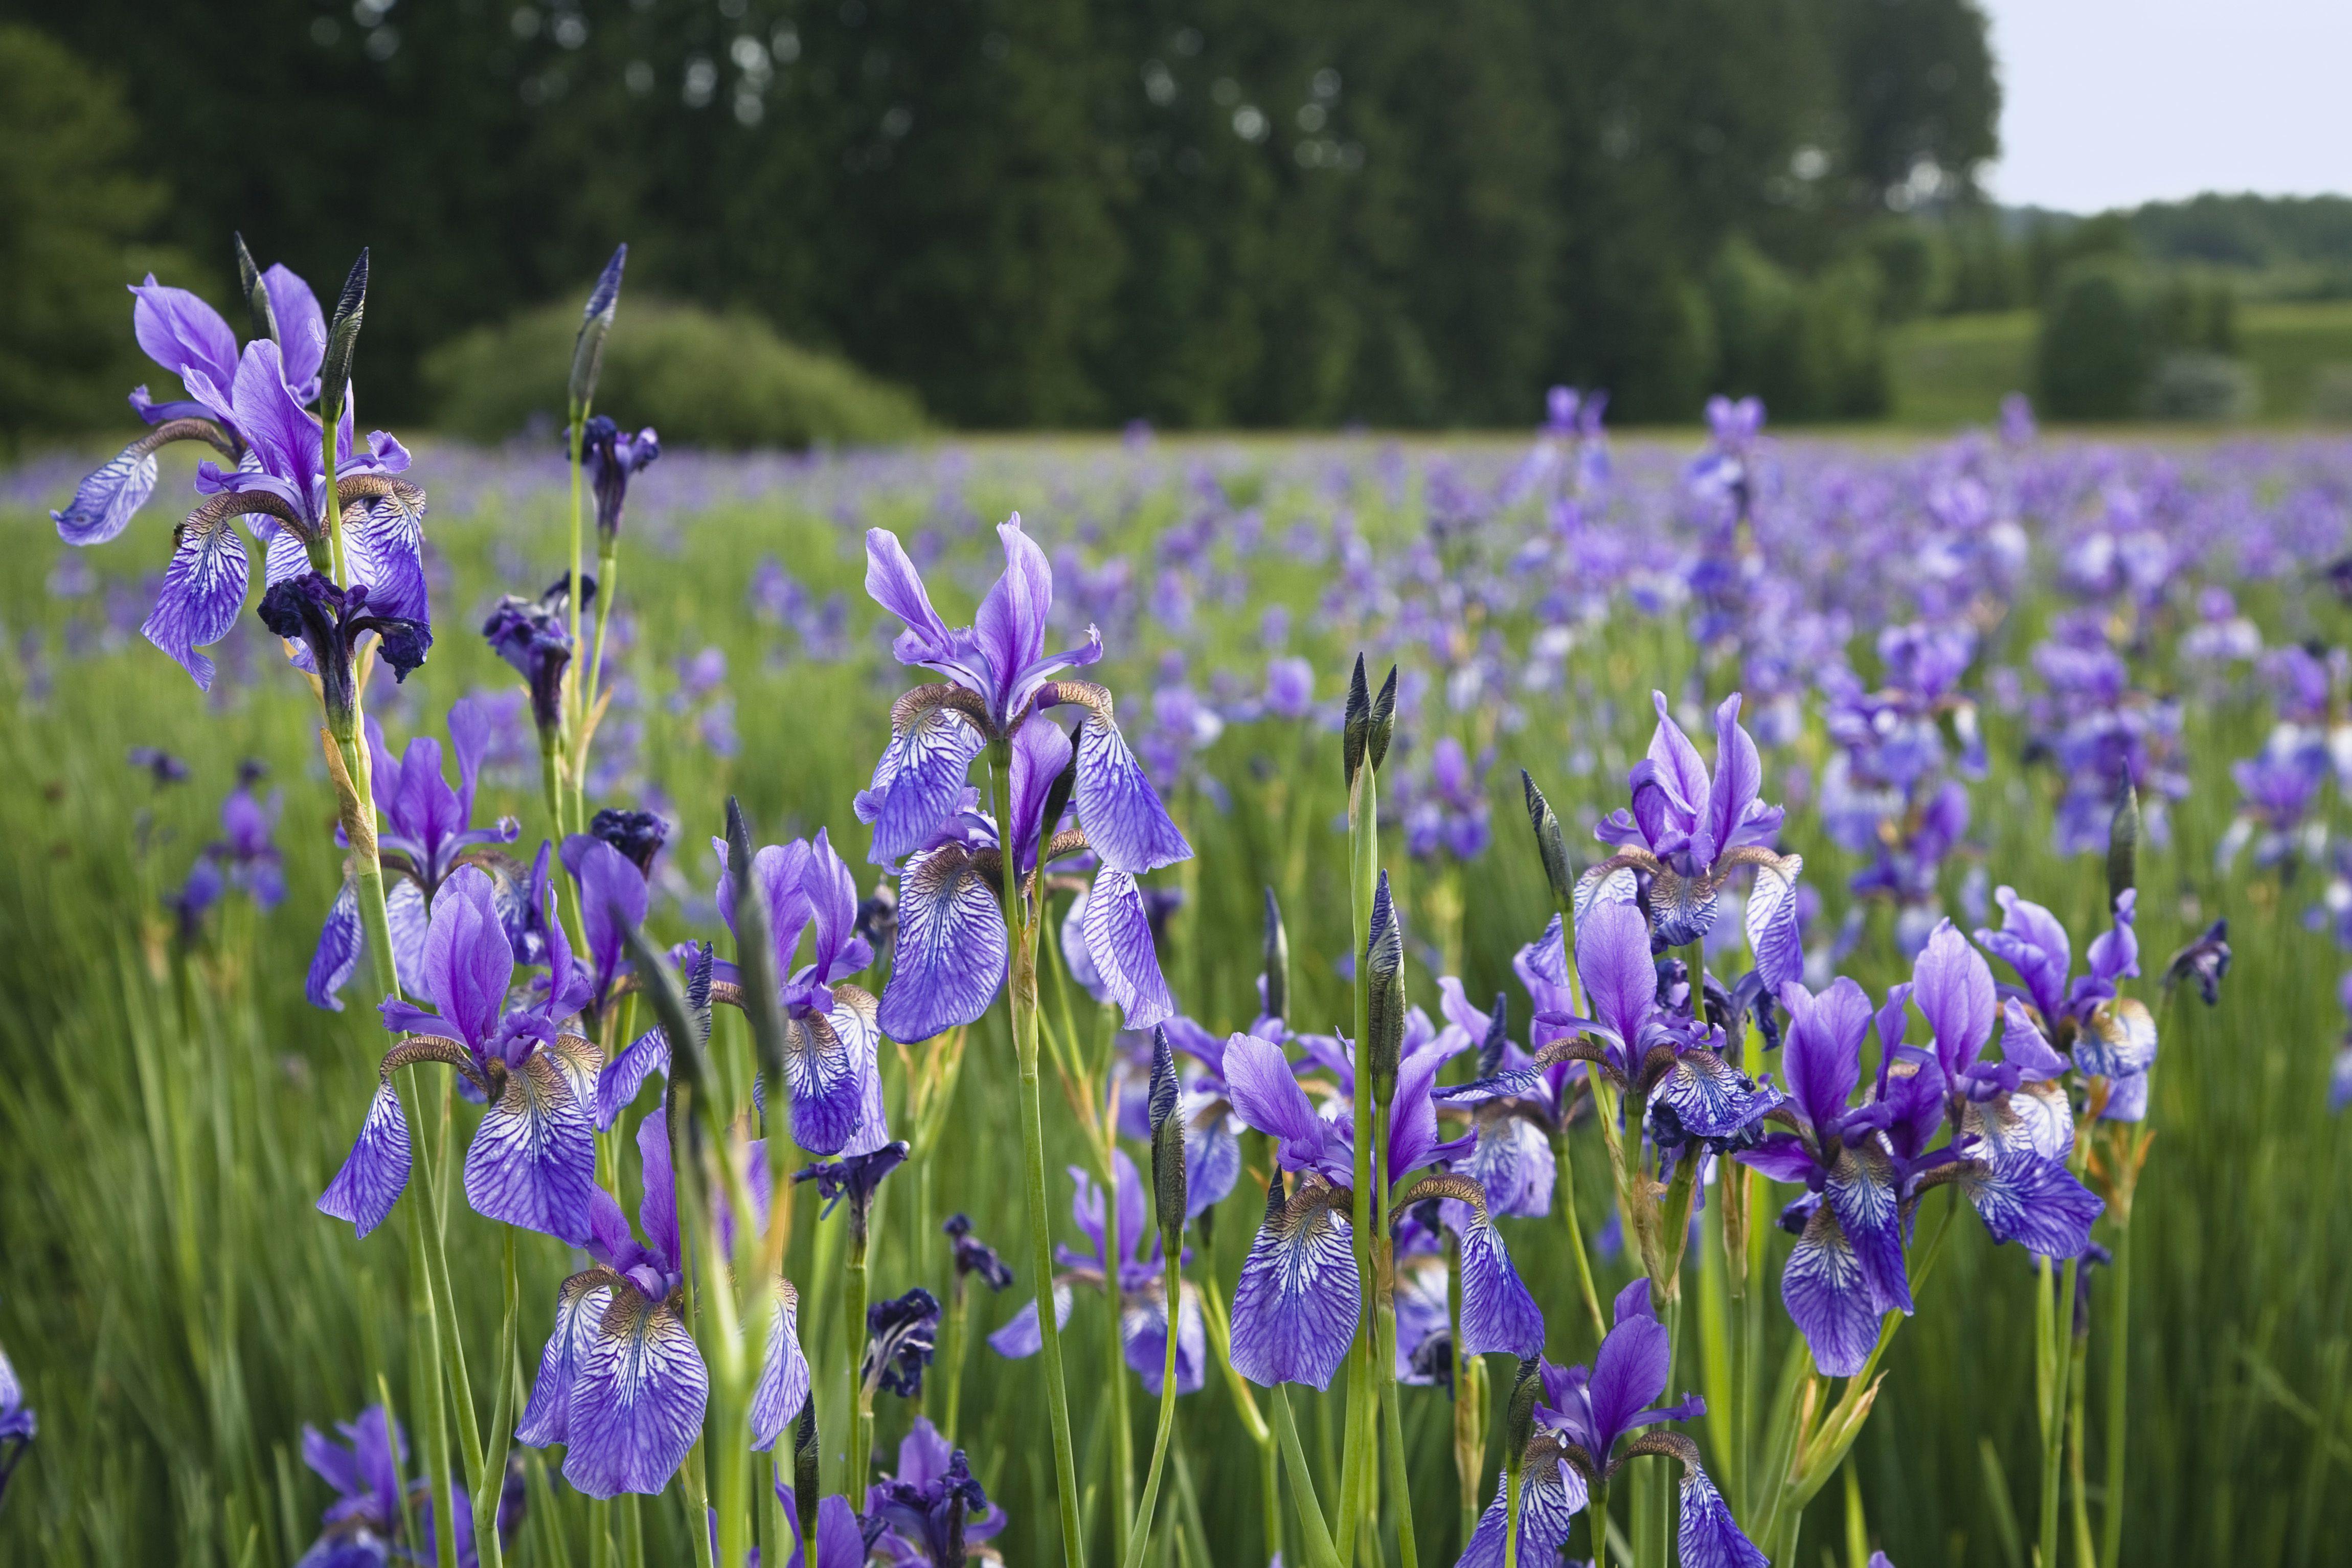 A field of Siberian iris